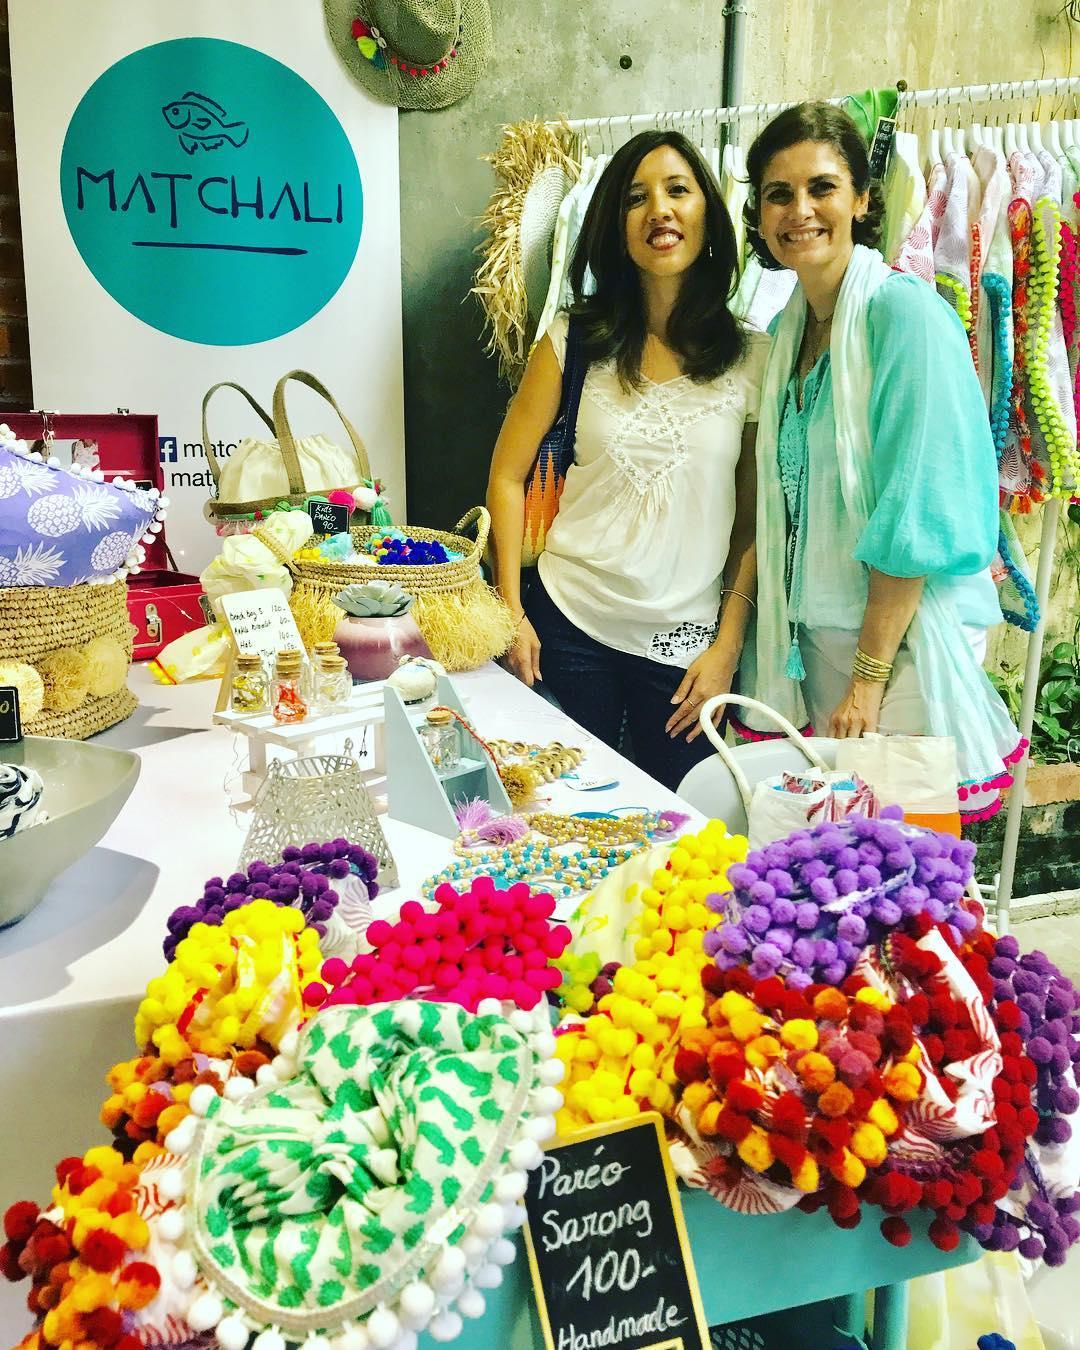 Batik&Bublbles_matchali_lemarchedenoel